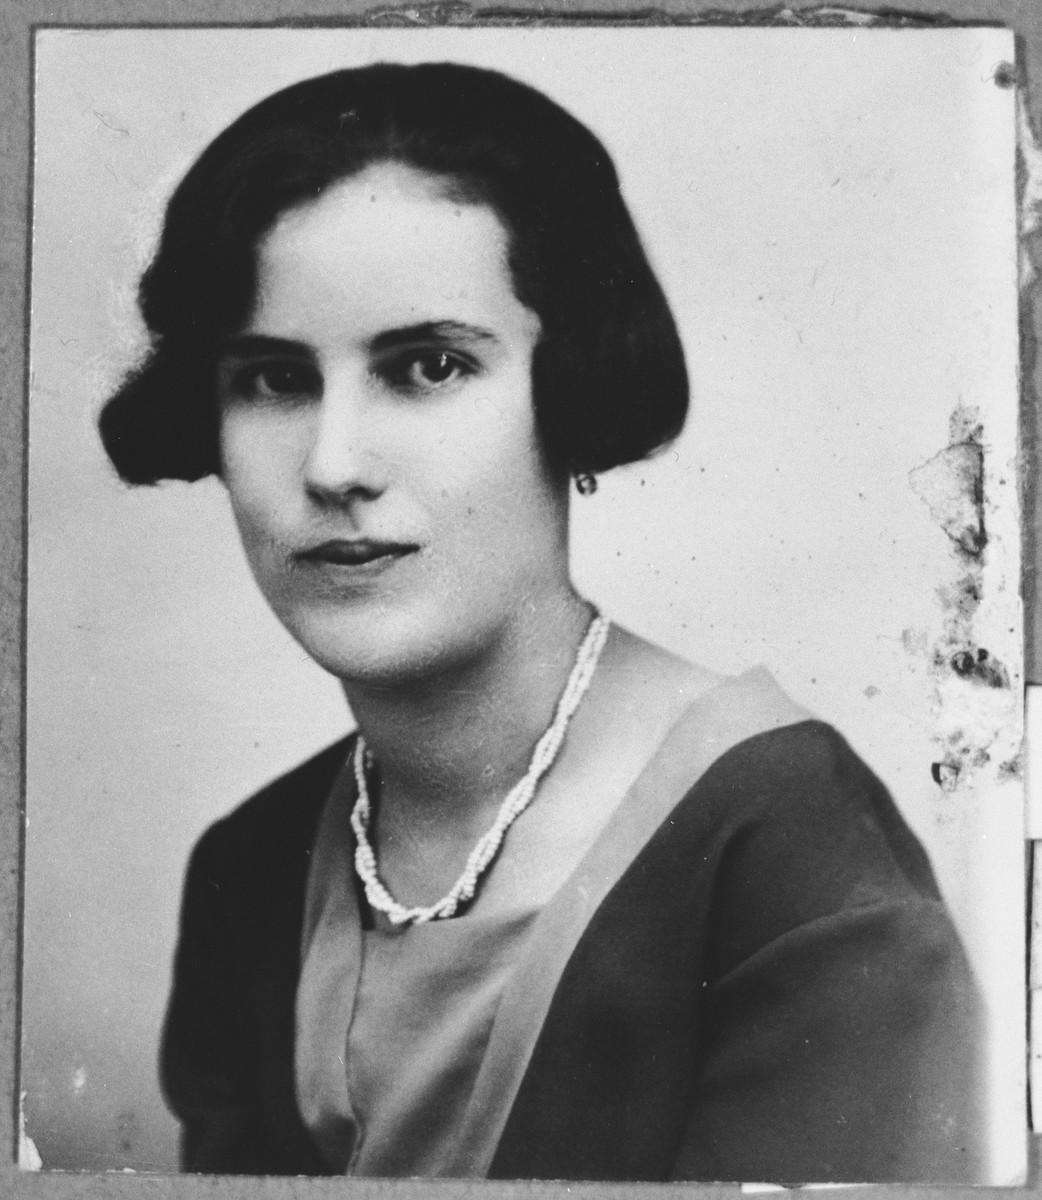 Portrait of Ana Kalderon, wife of Nissim Kalderon.  She lived at Karagoryeva 52 in Bitola.